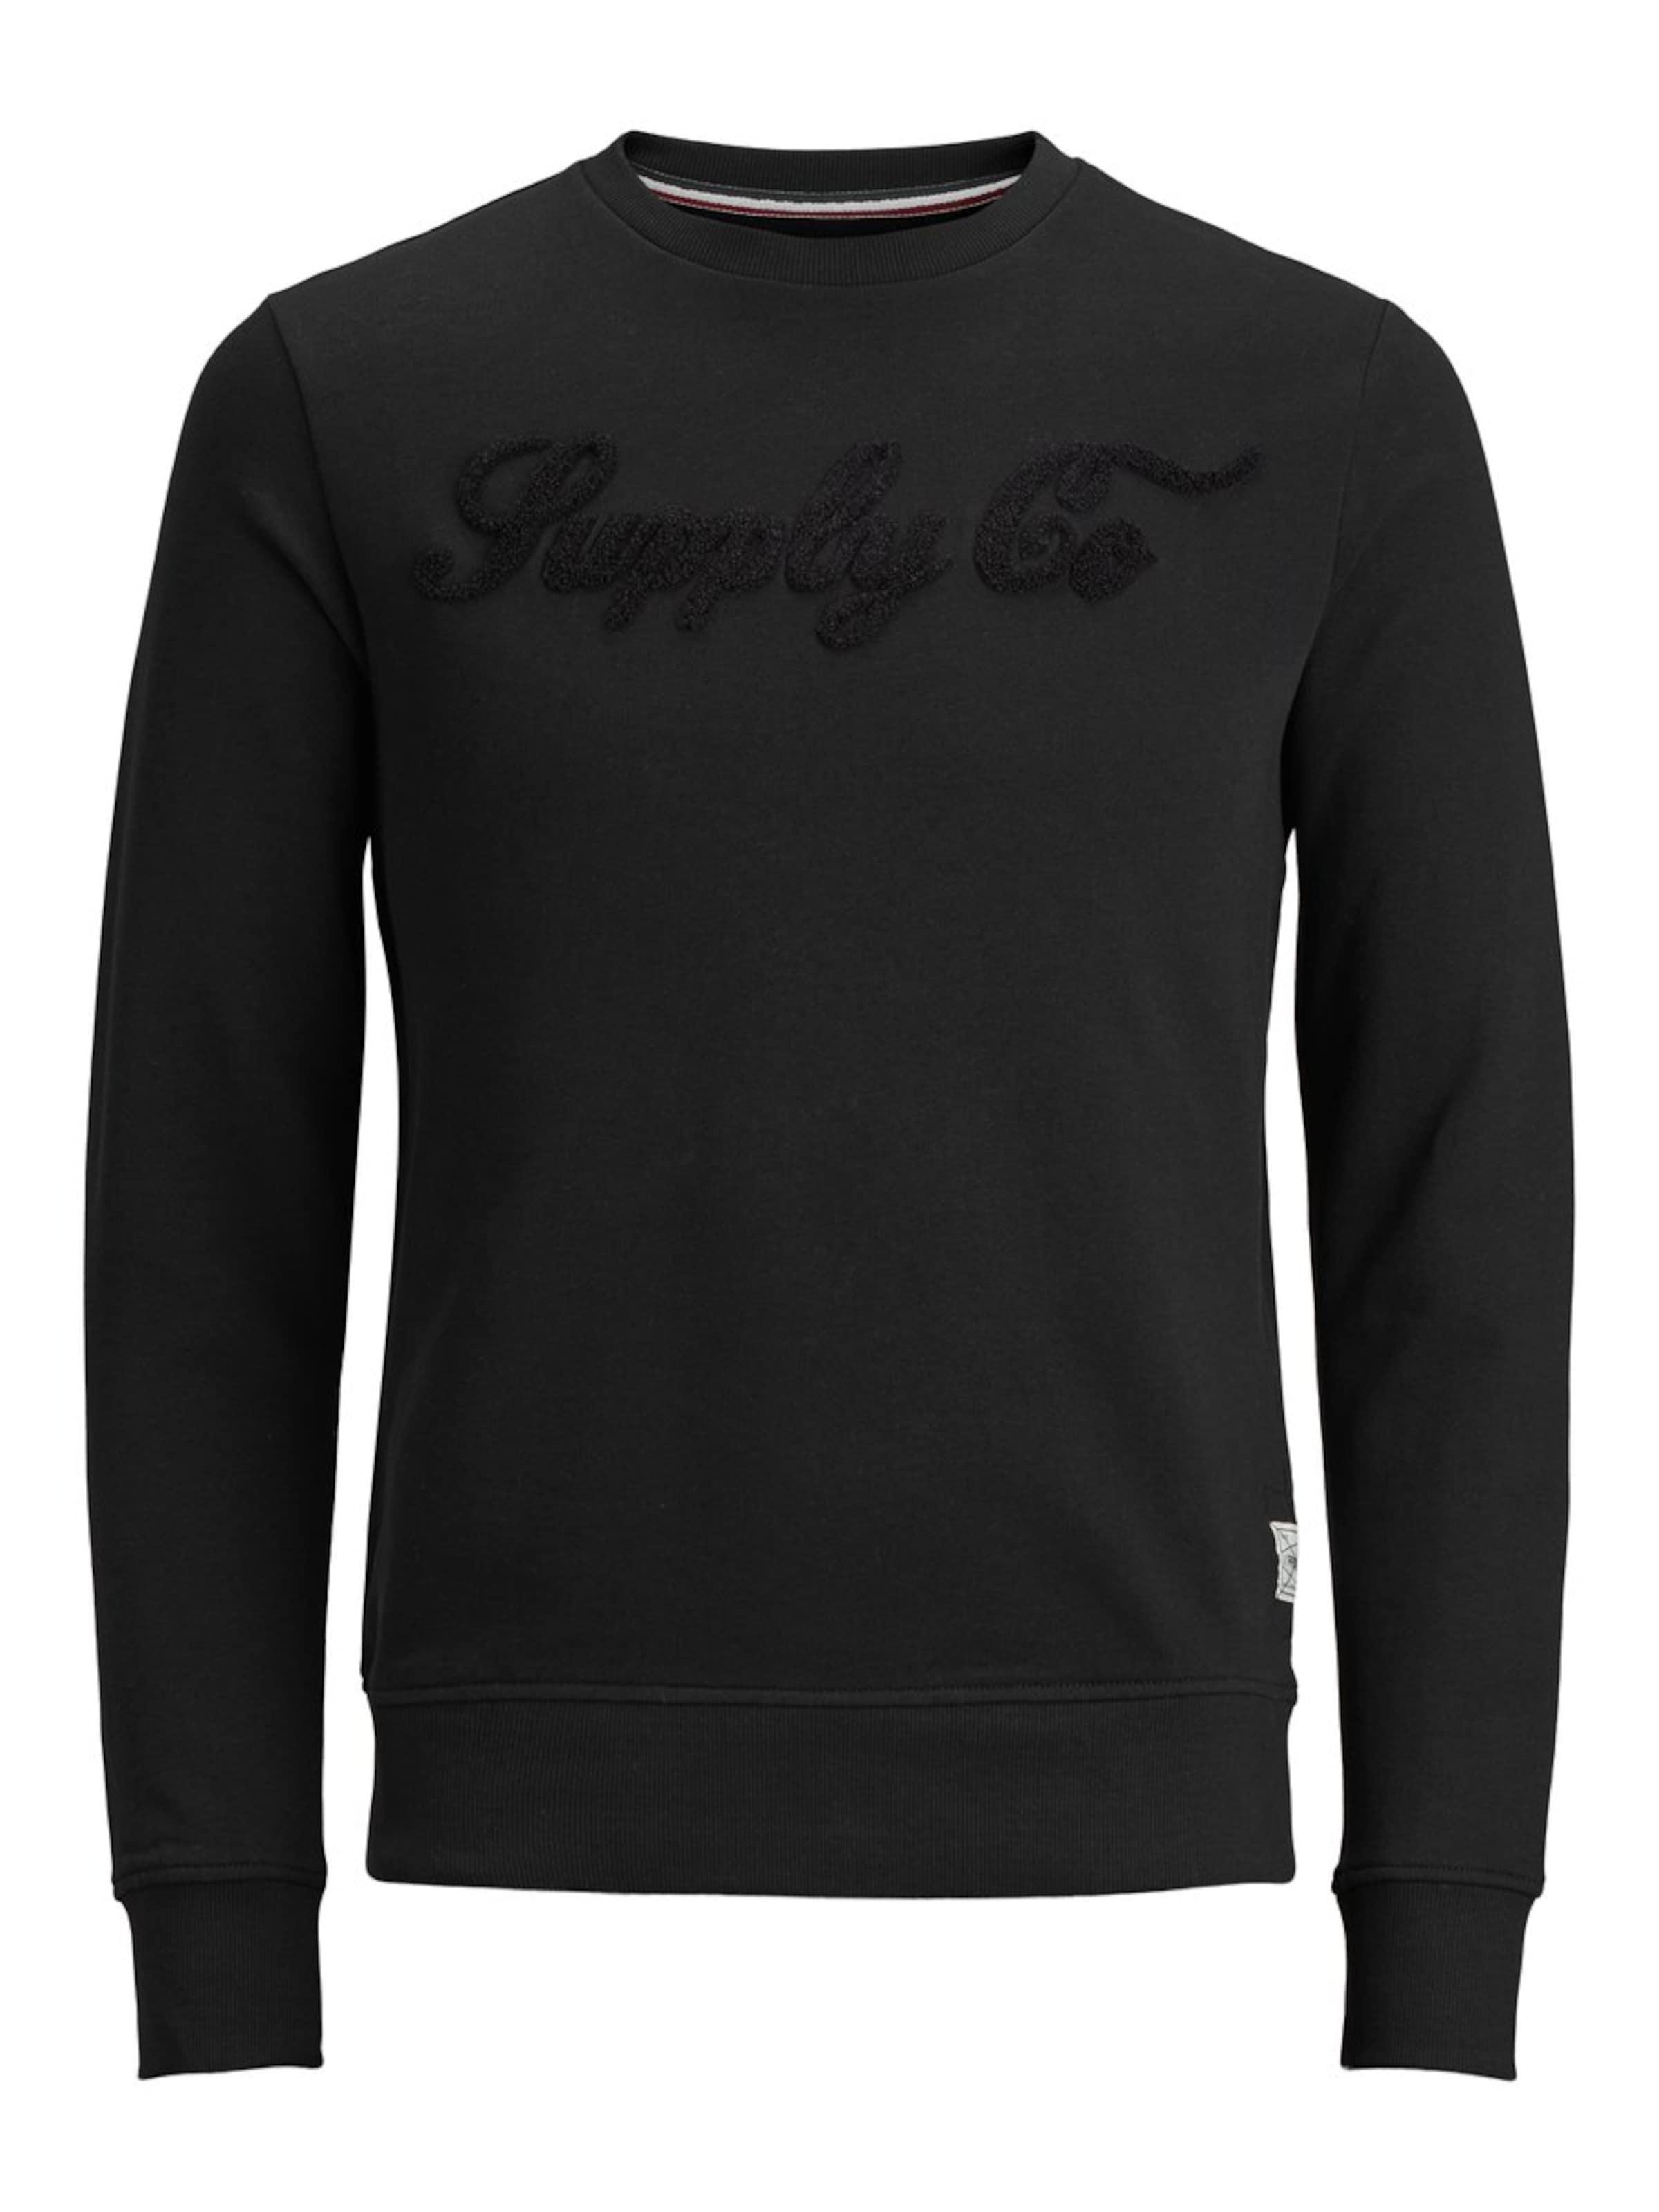 In Produkt In Sweatshirt Produkt In Sweatshirt Schwarz Produkt Sweatshirt Schwarz wuTXkZOPi